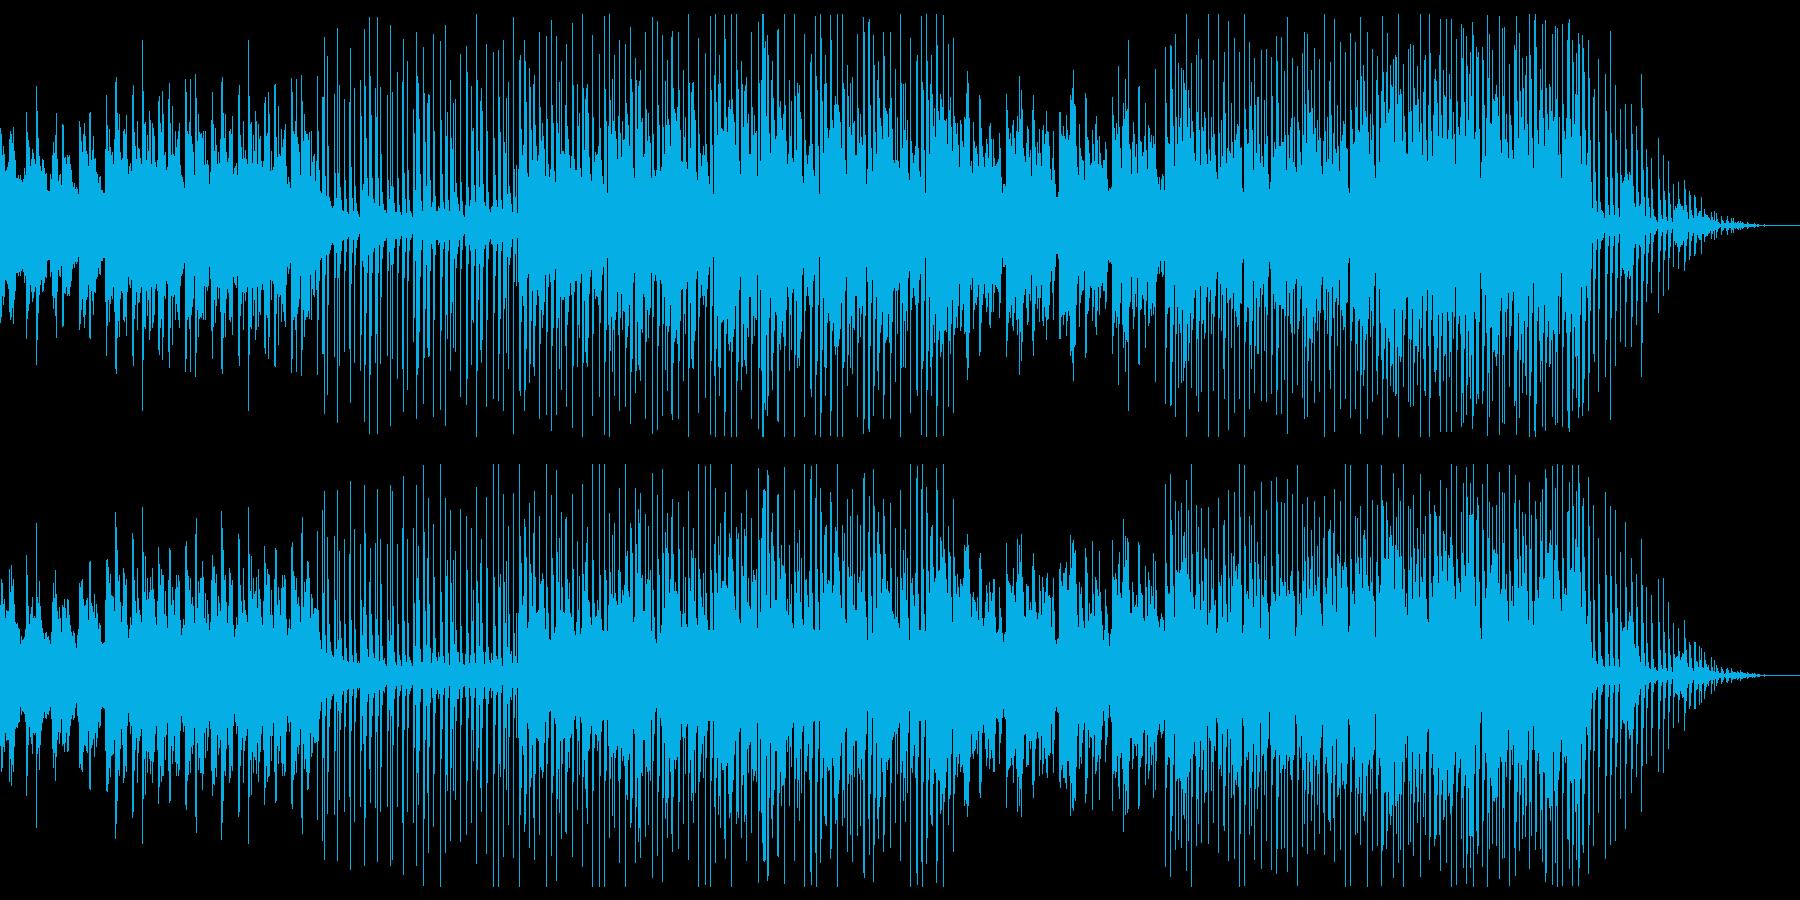 EDMトロピカルハウス 哀愁のある雰囲気の再生済みの波形